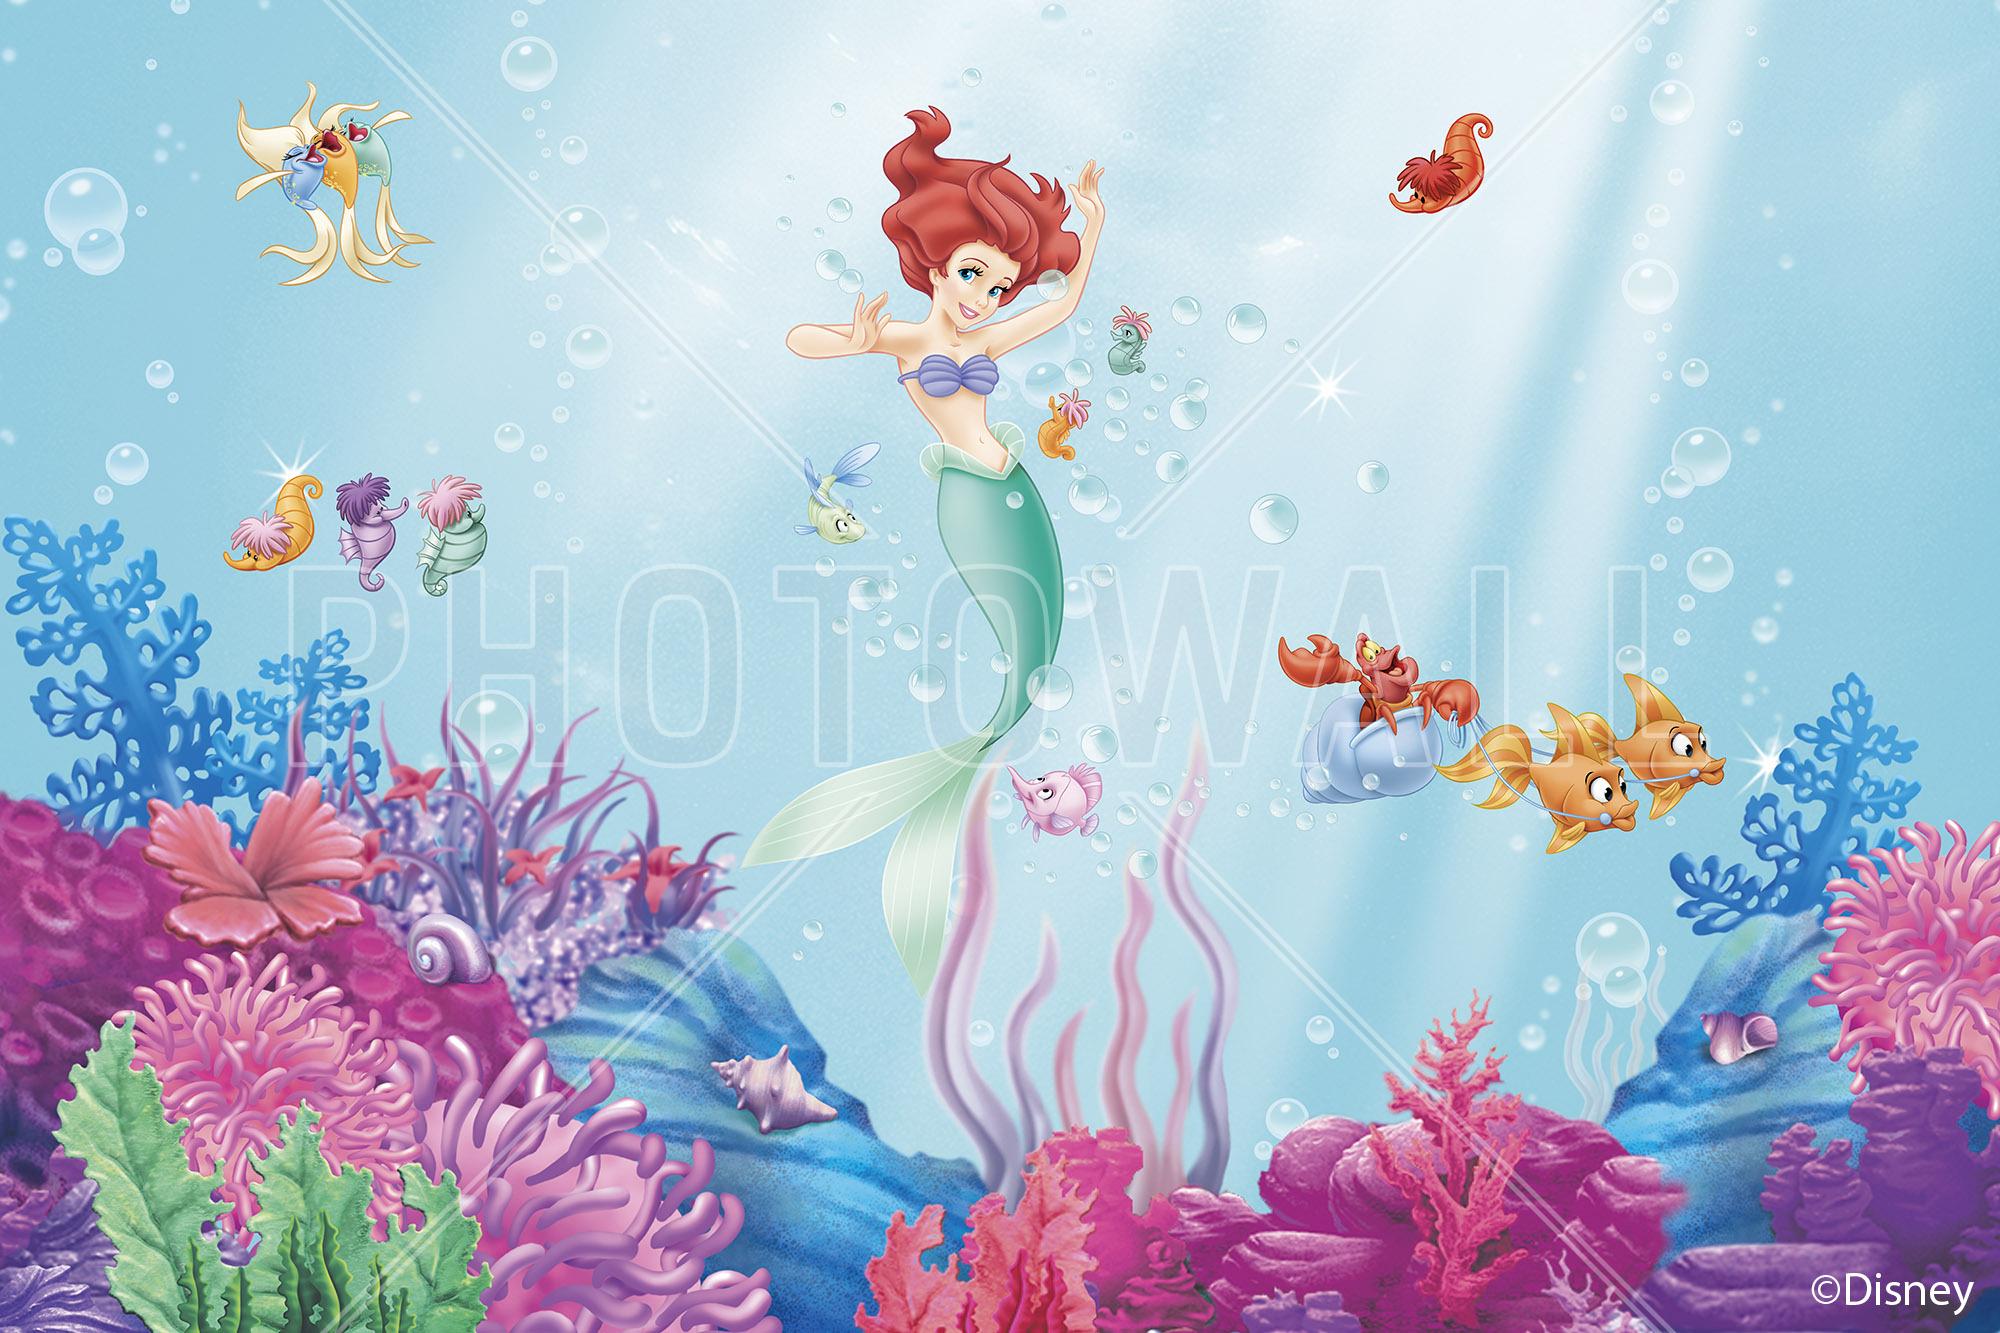 Filename: Princess Little Mermaid?wu003d620u0026